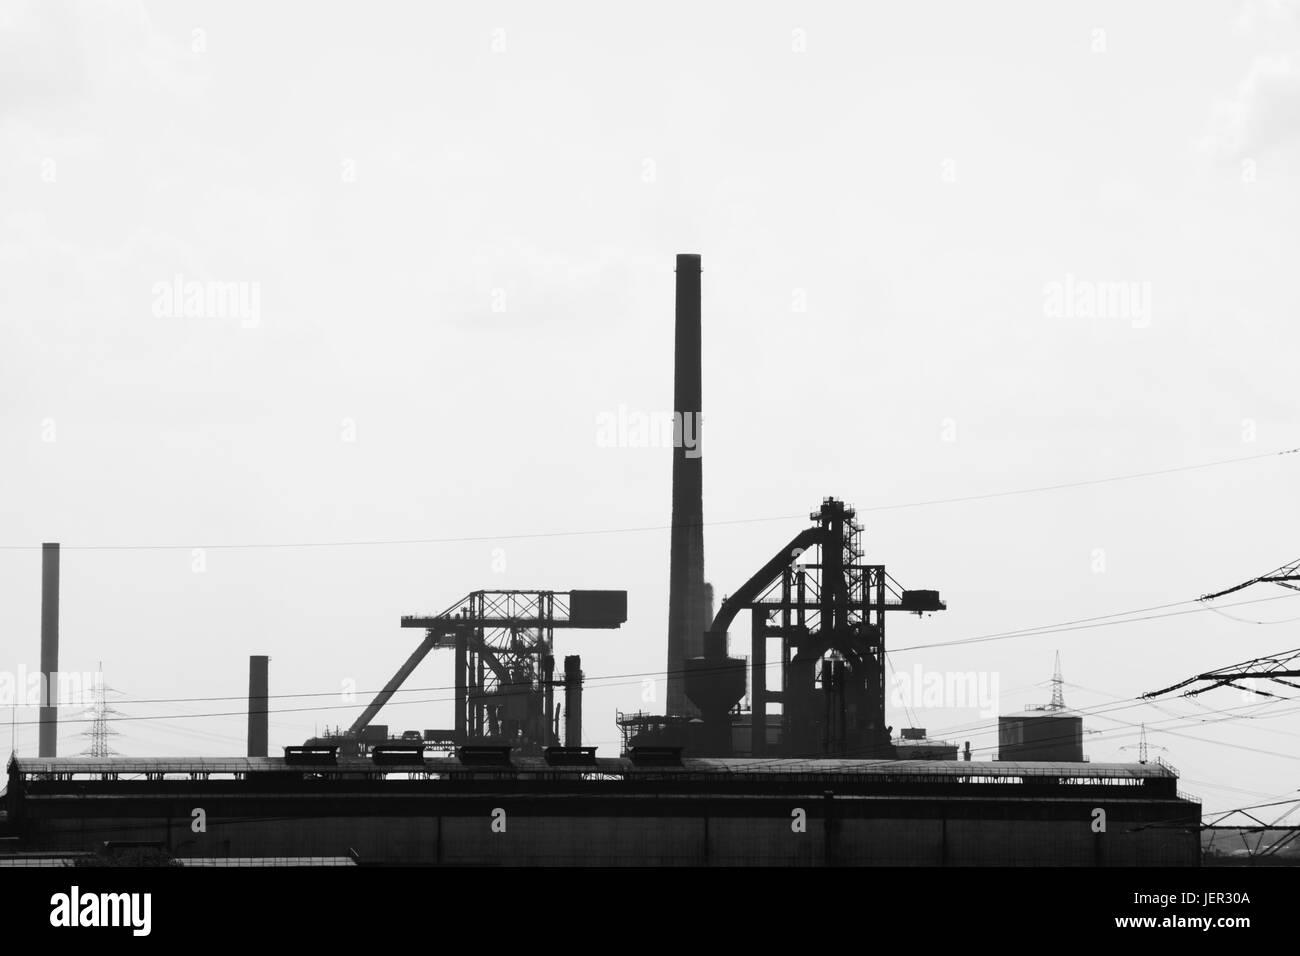 Duisburg Germany - Stock Image